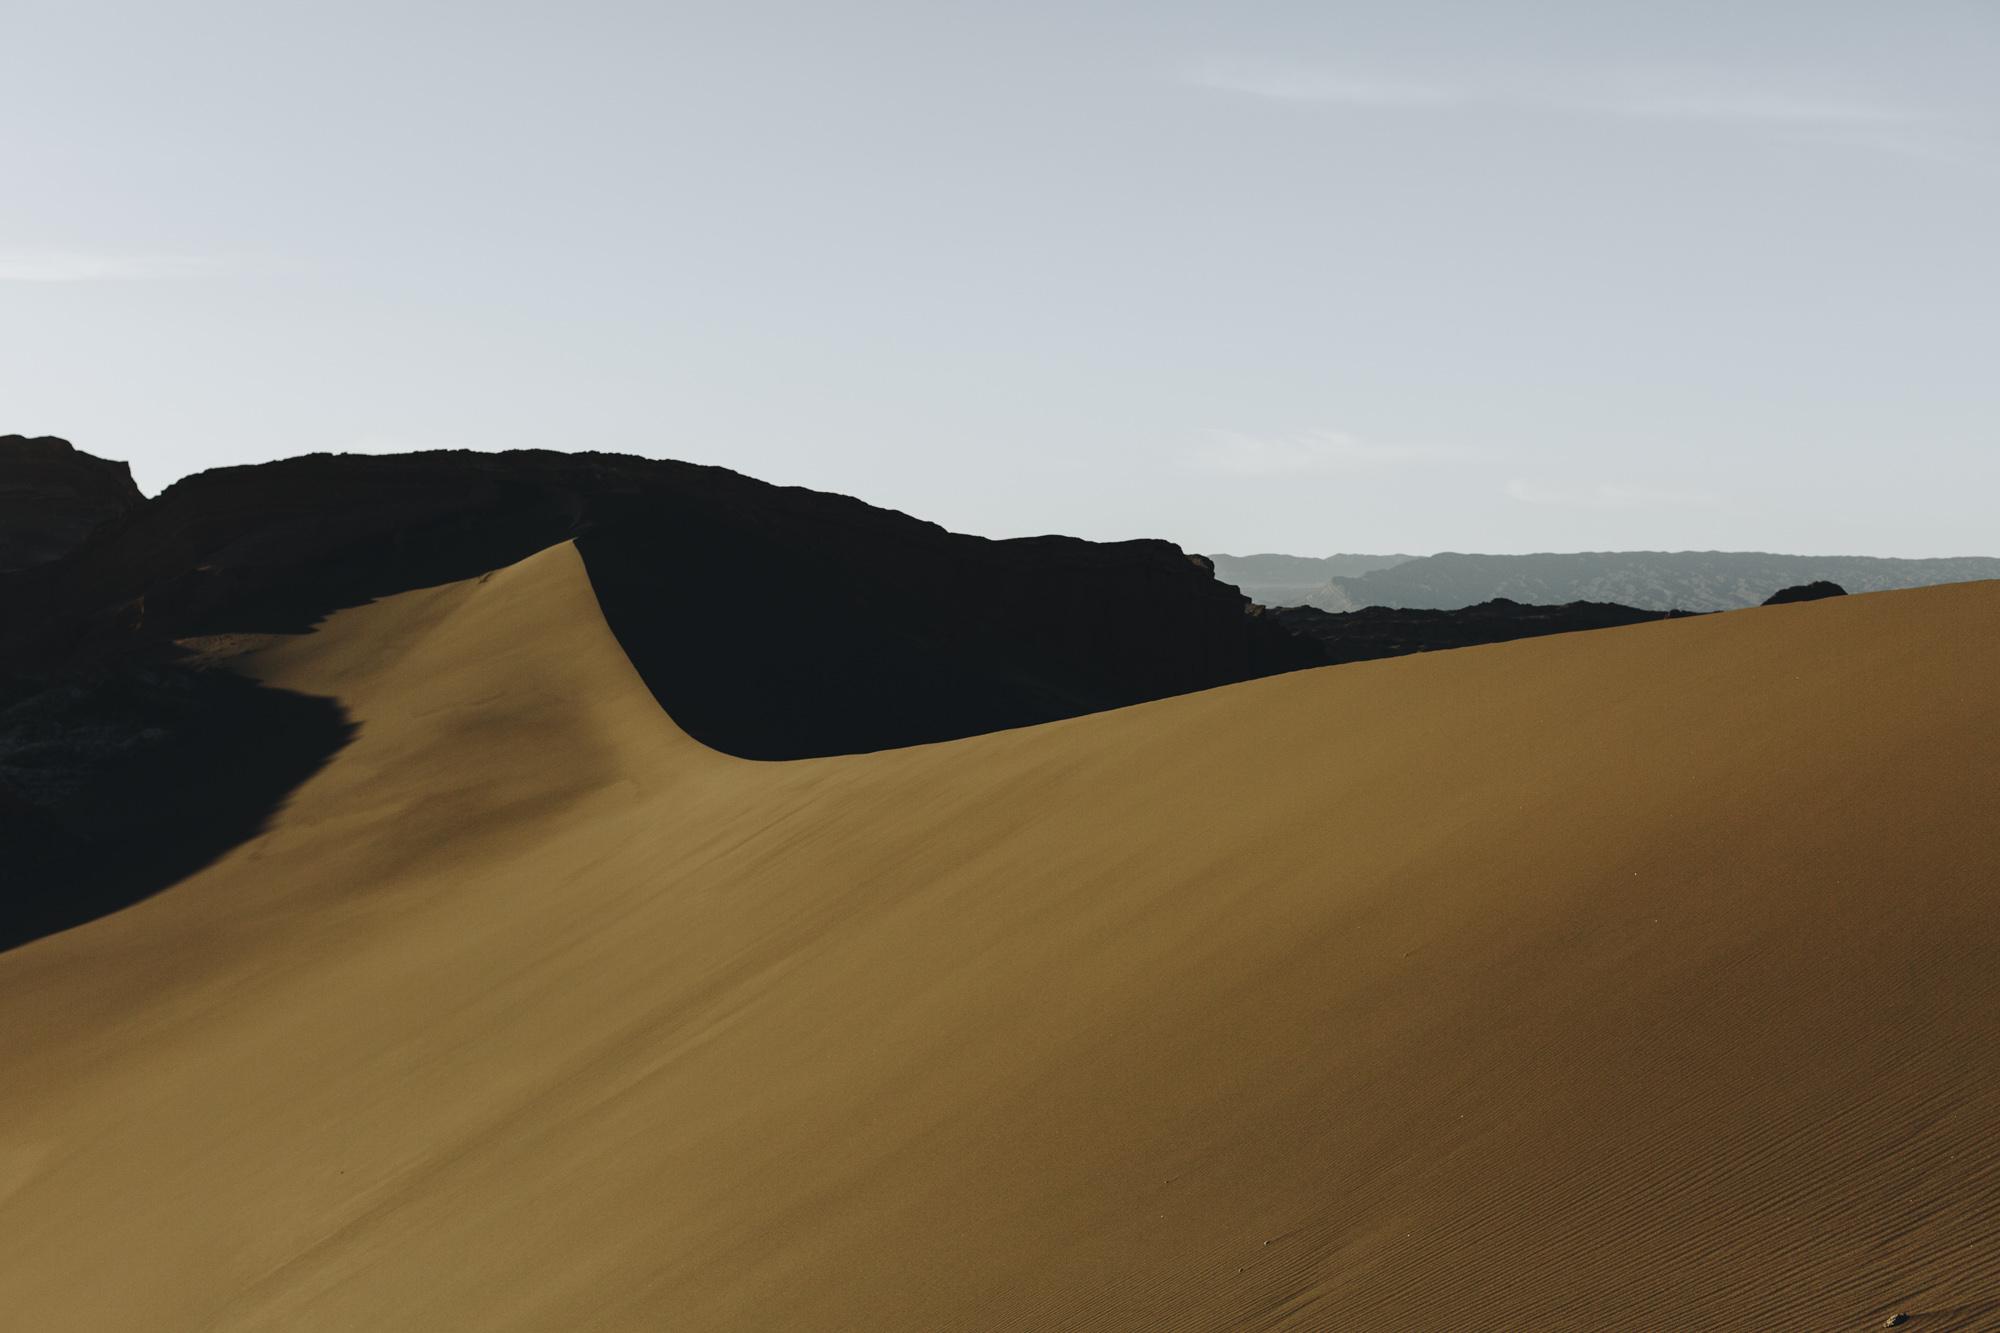 Mael Lambla photographer Chile San pedro atacama desert-145.jpg